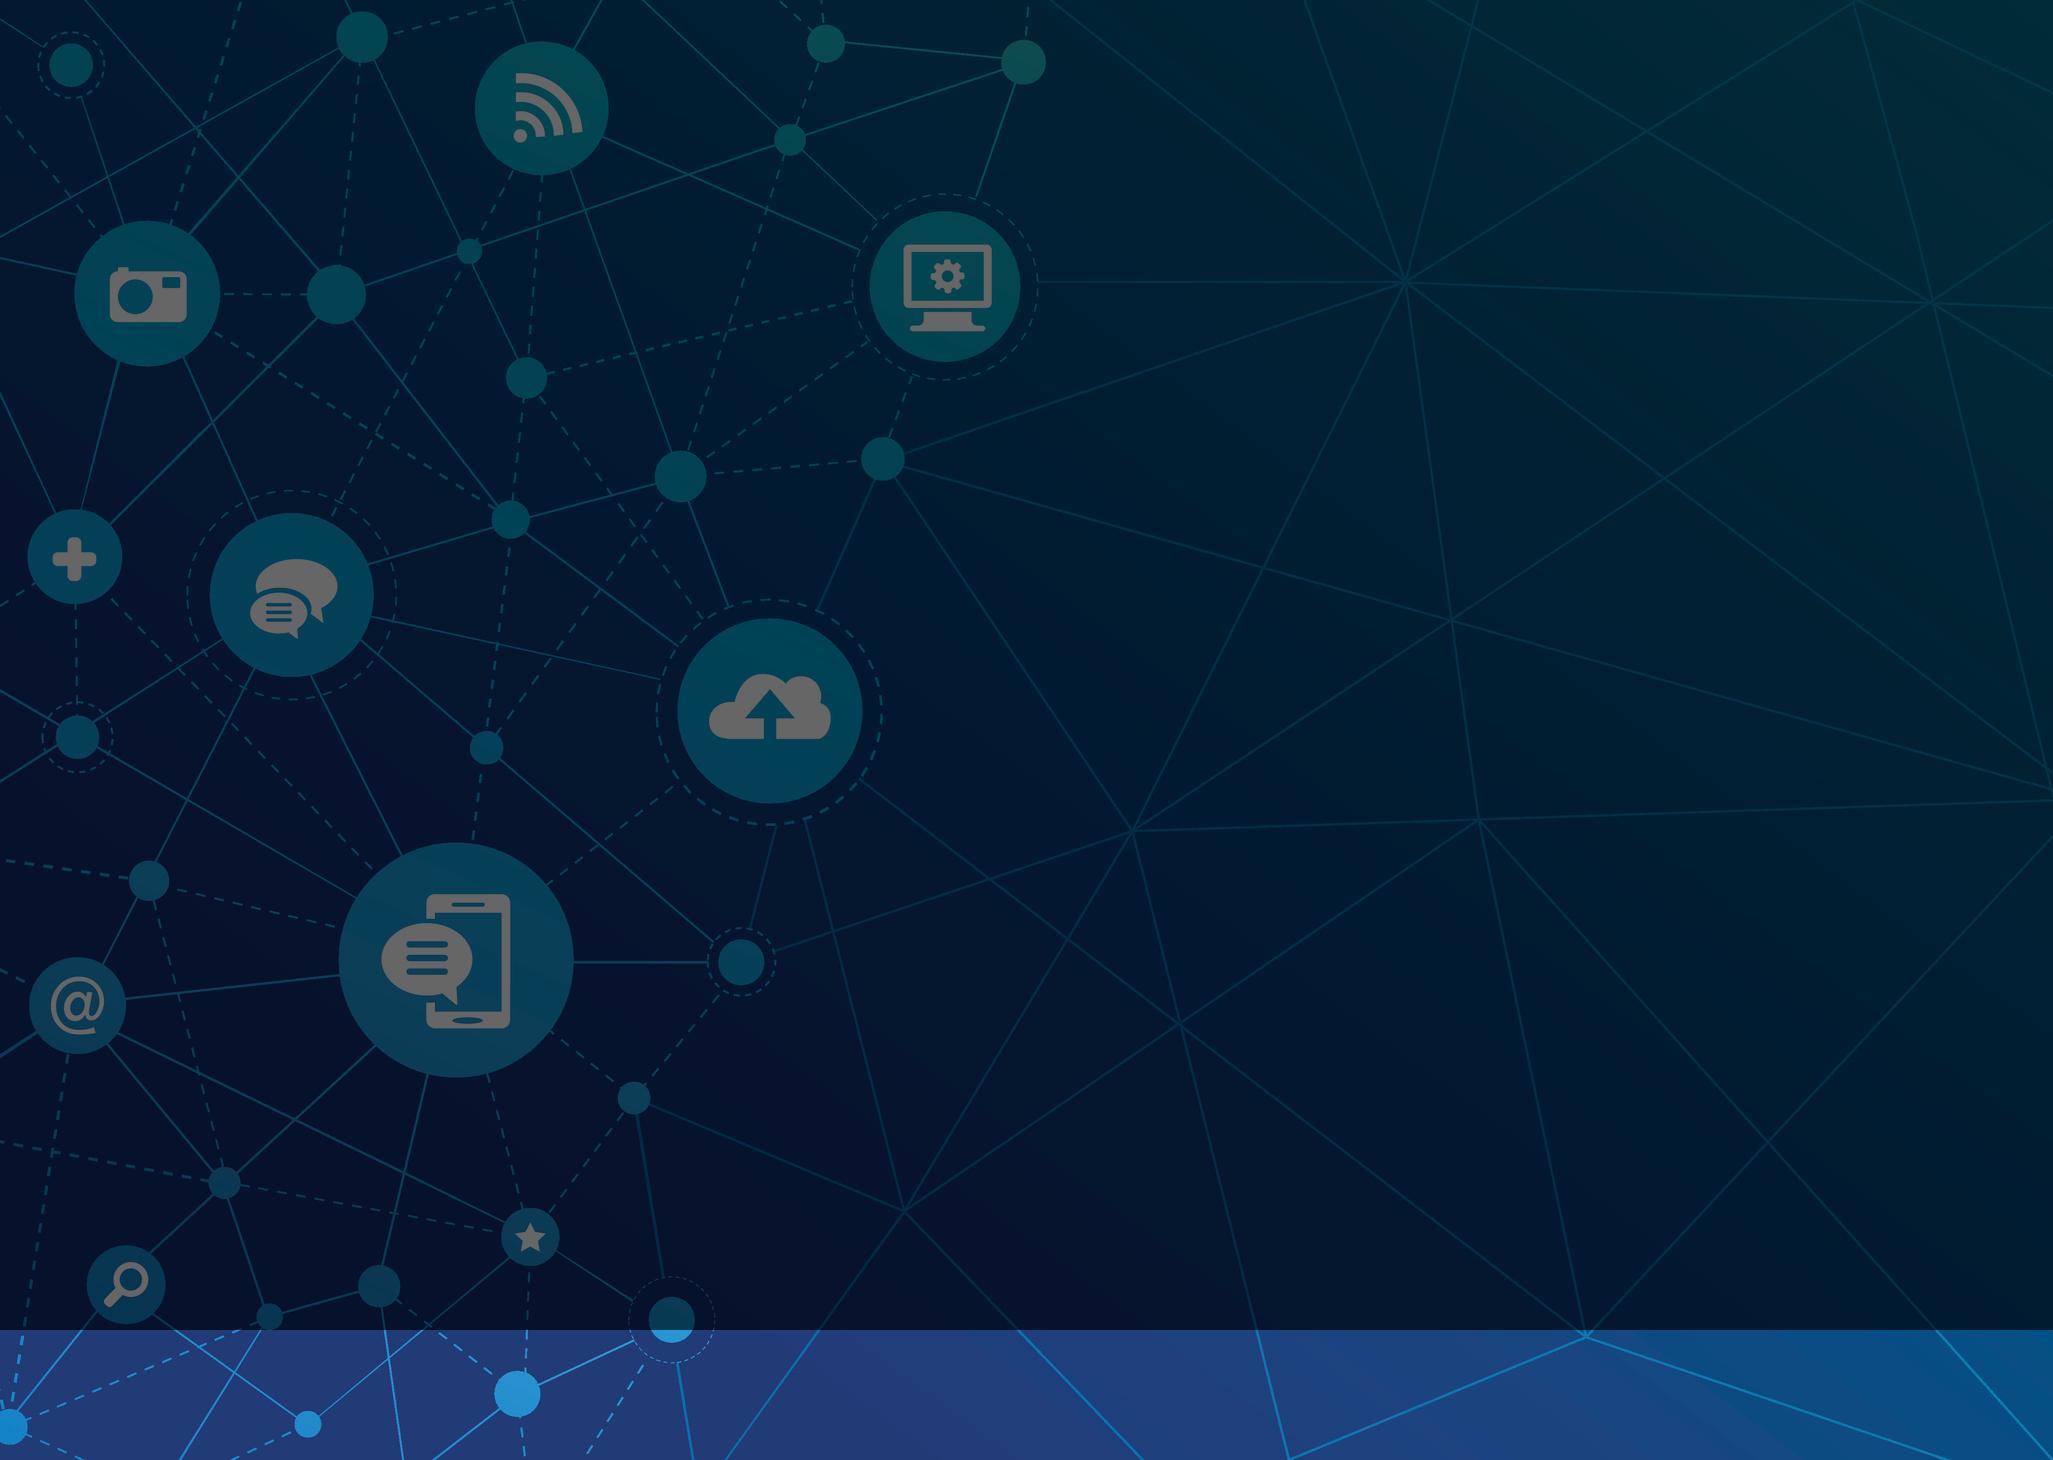 Technologic-Network-Dots---Communication-636876604_2056x1462-mdark.png